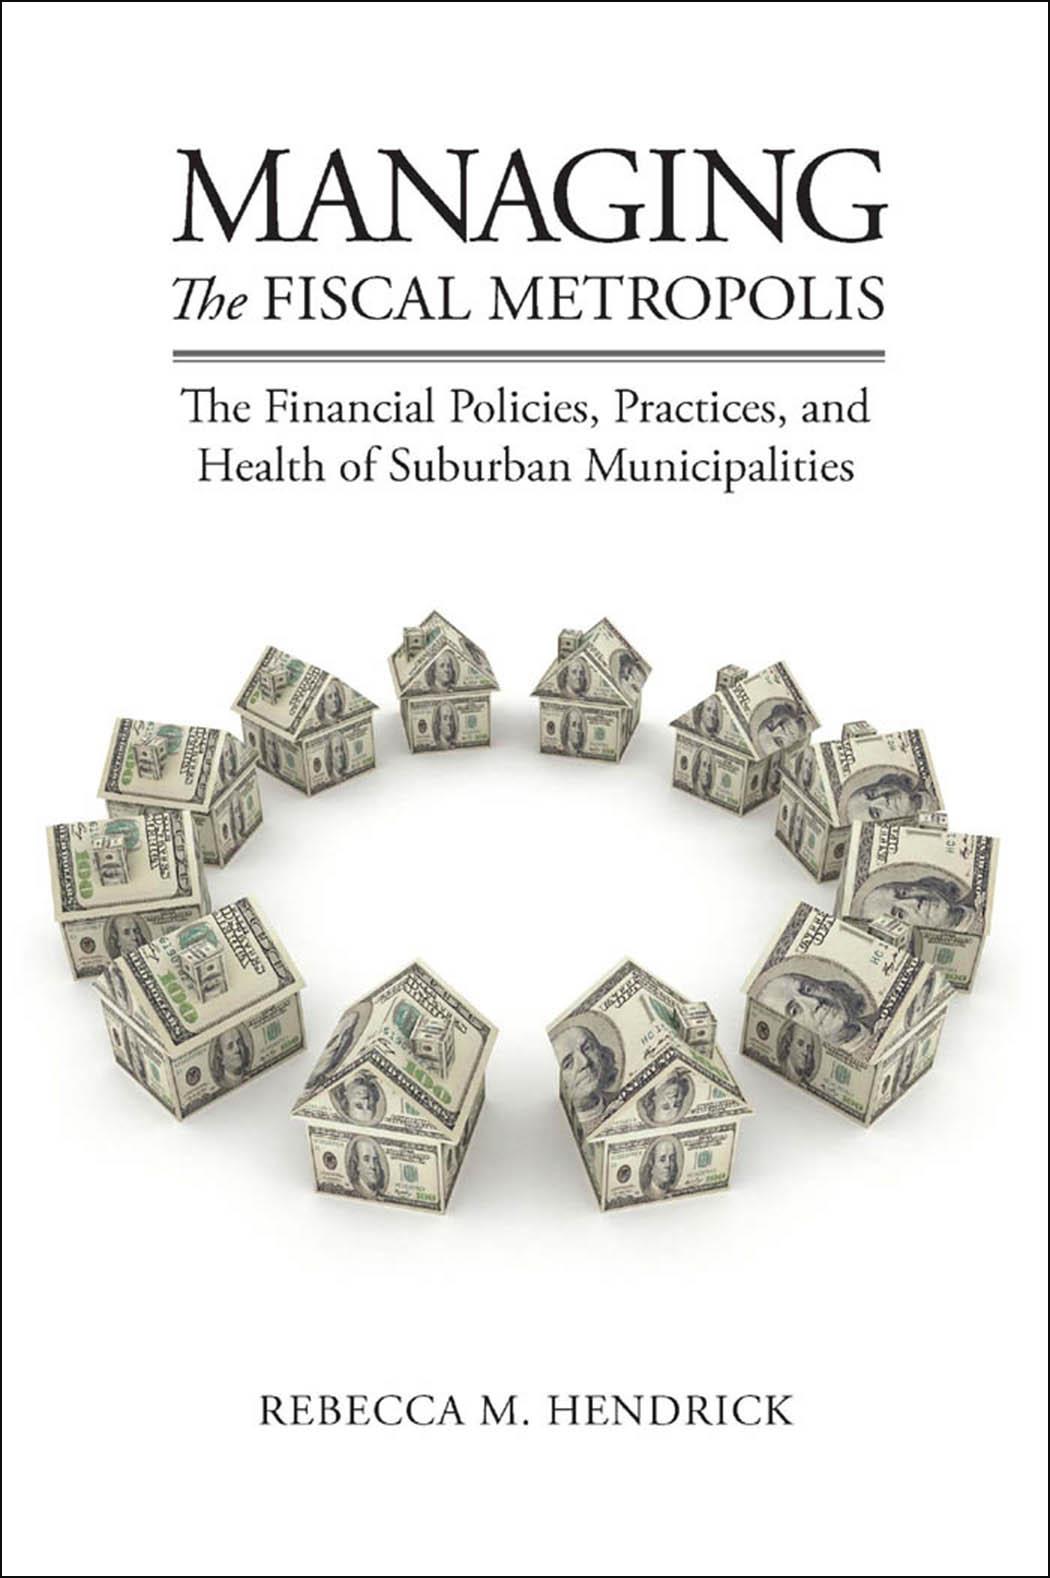 Managing the Fiscal Metropolis